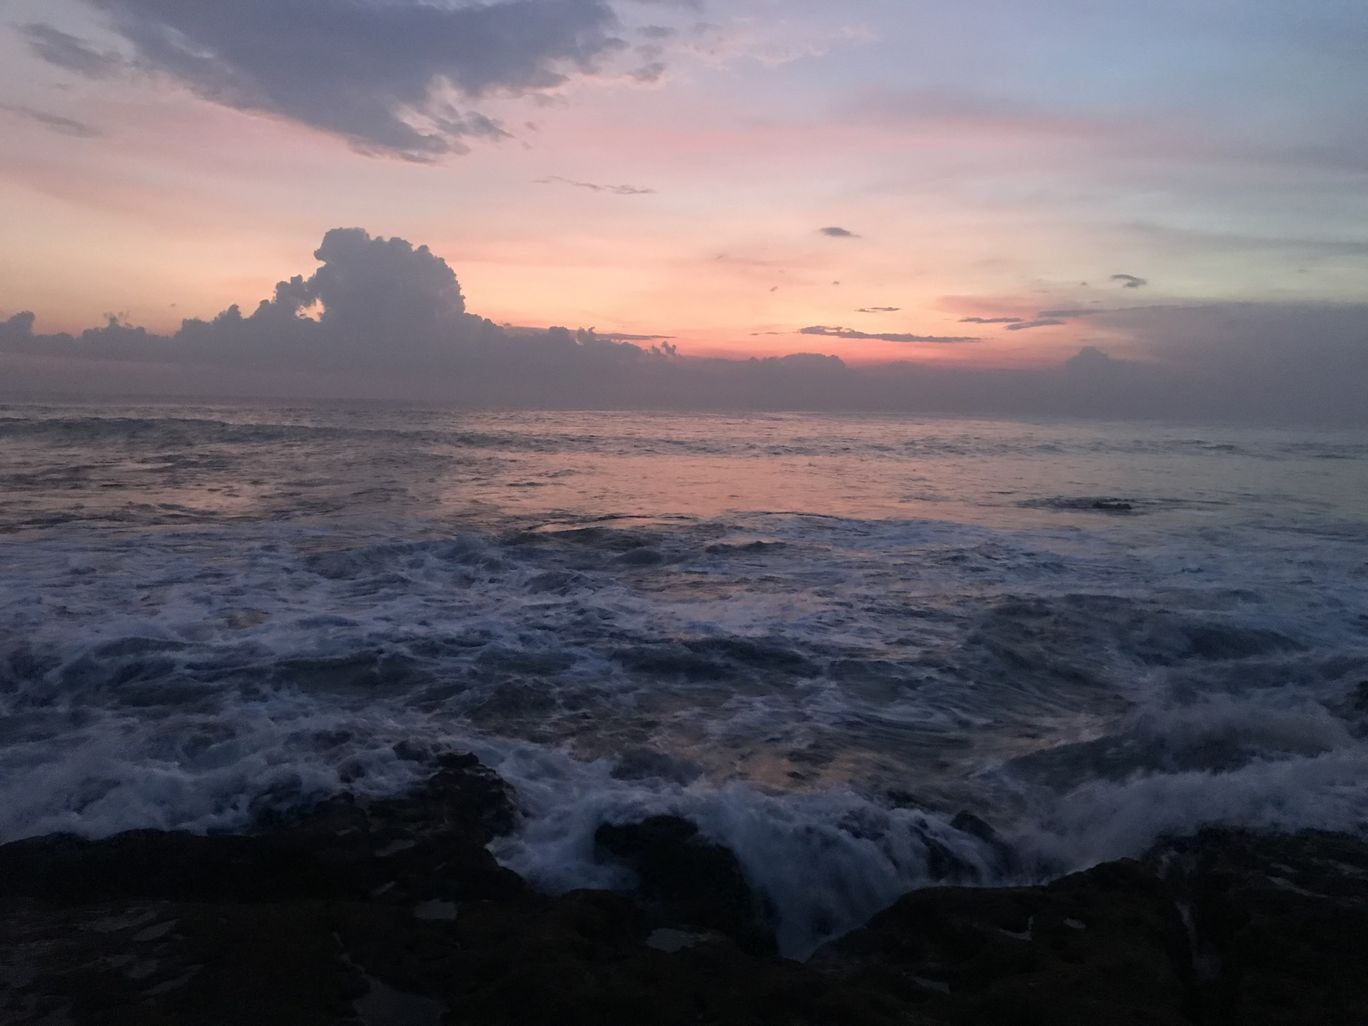 Photo of Bali By Divya Choudhary